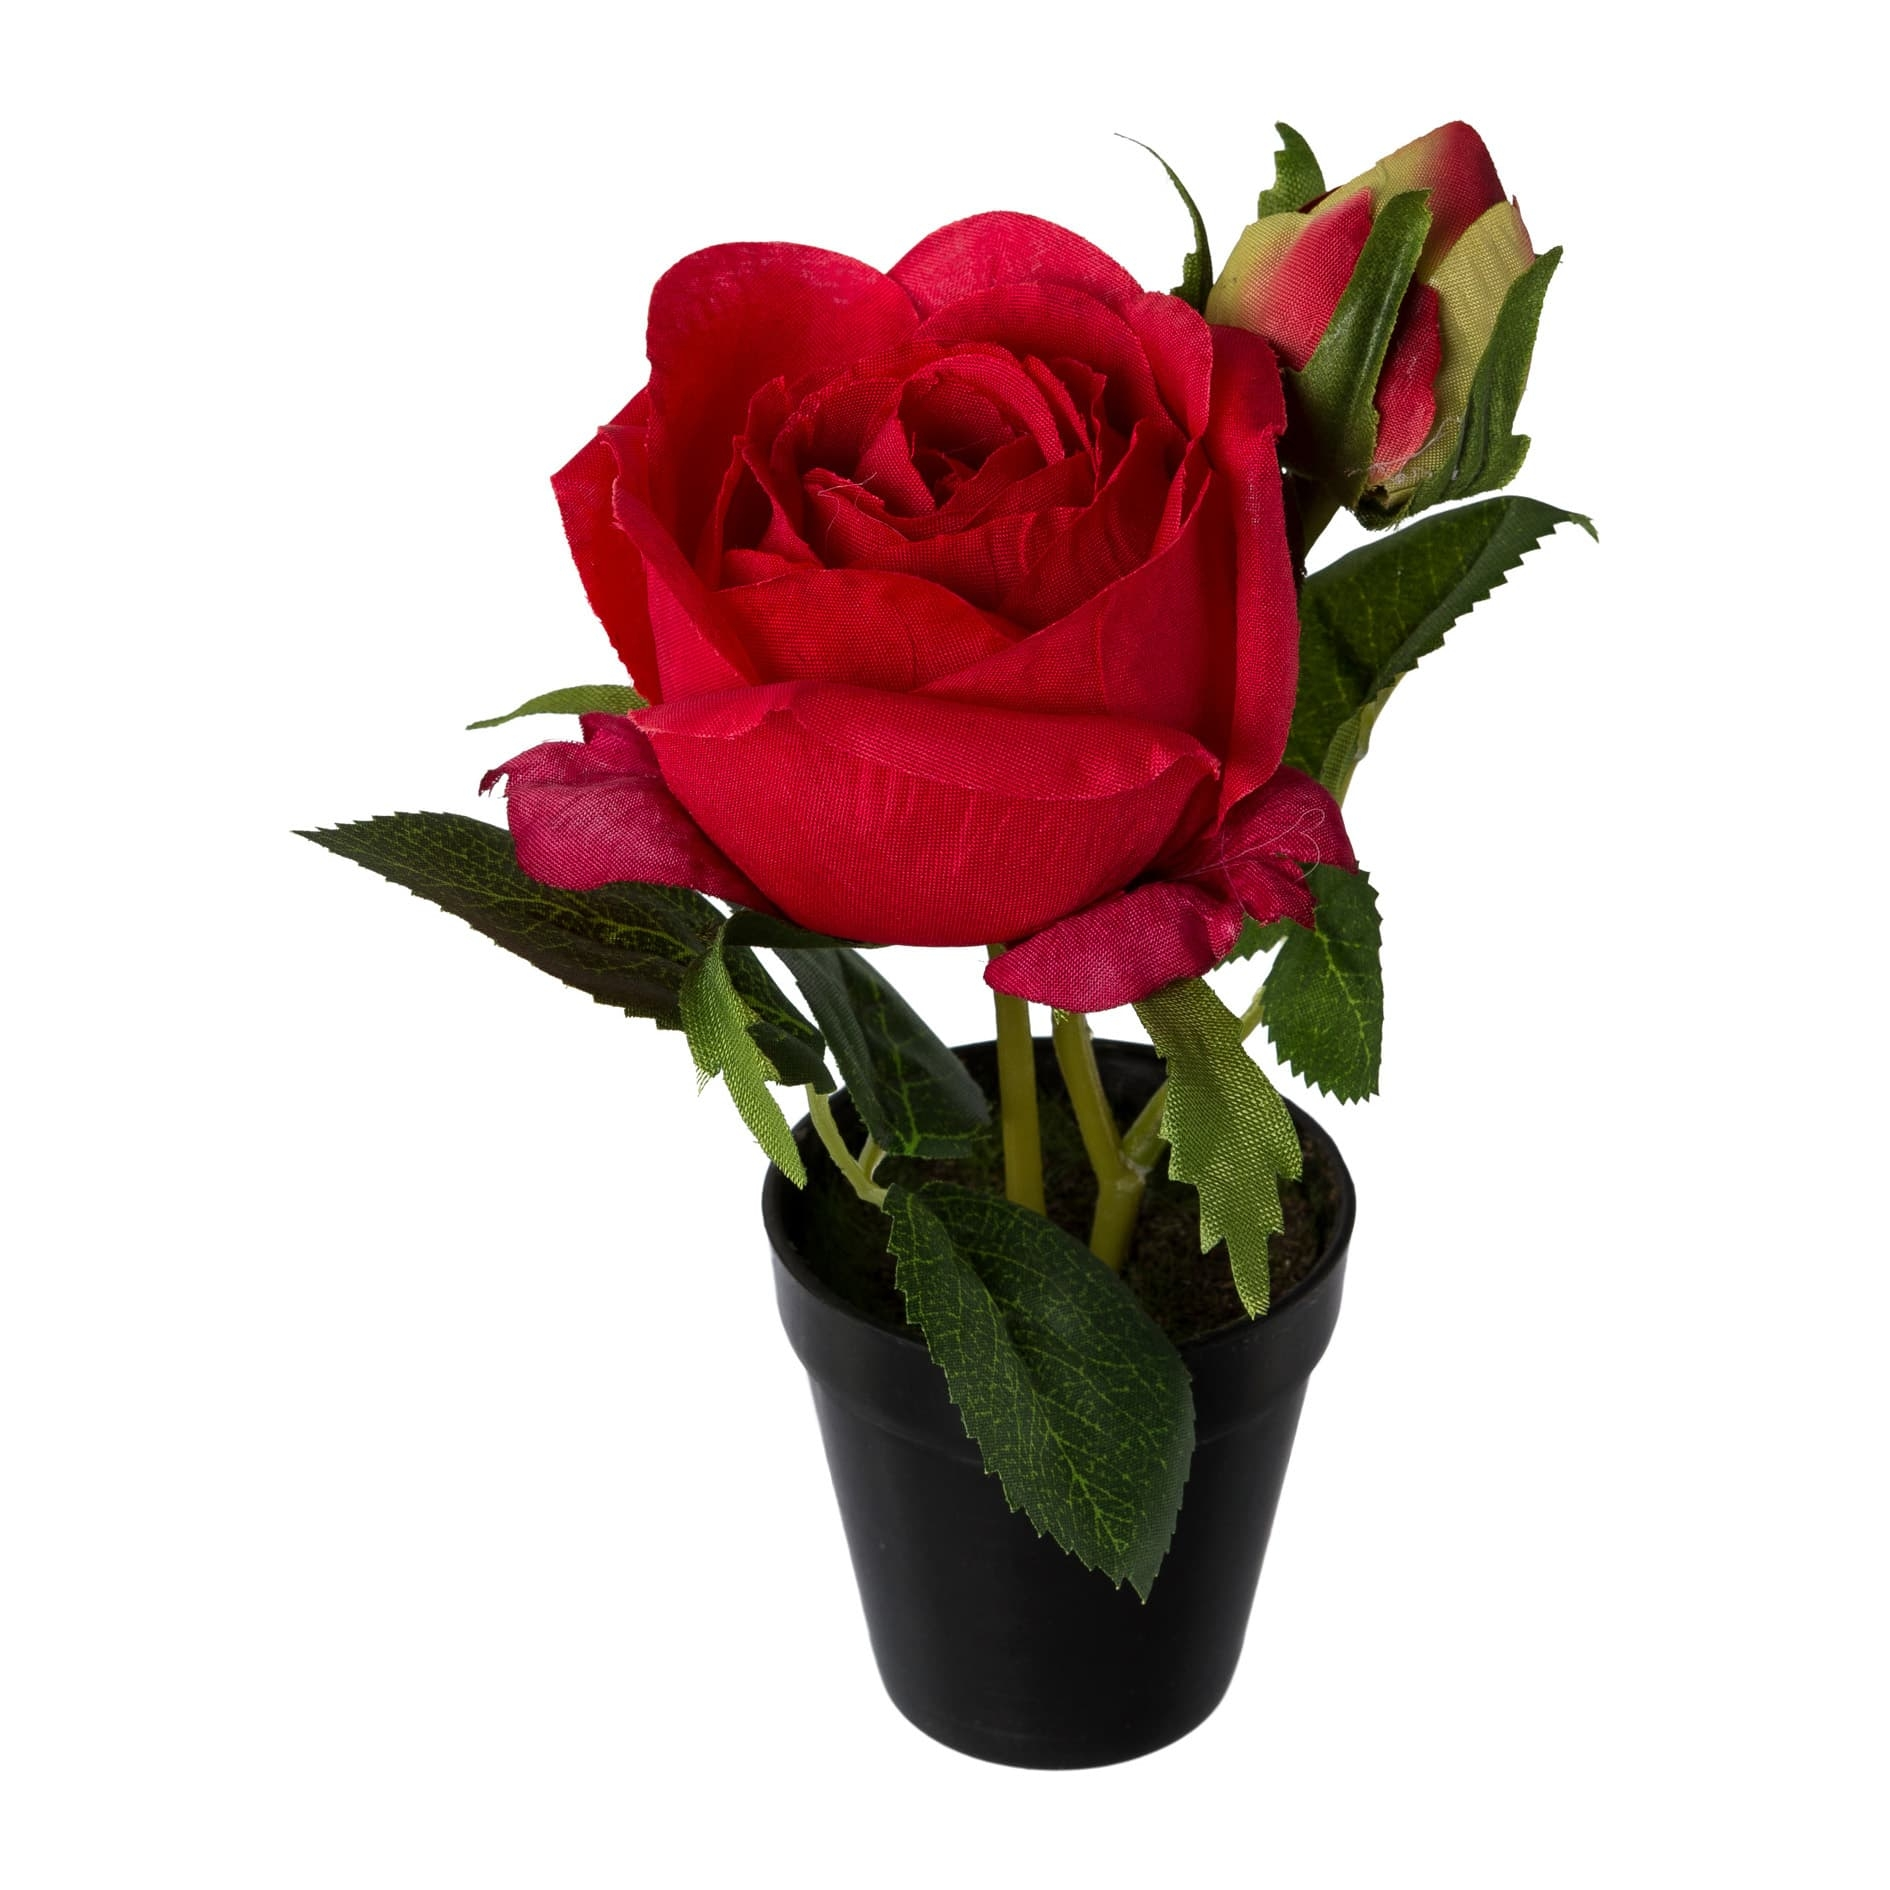 Floare artificiala in ghiveci, Rose Rosu, H17 cm somproduct.ro